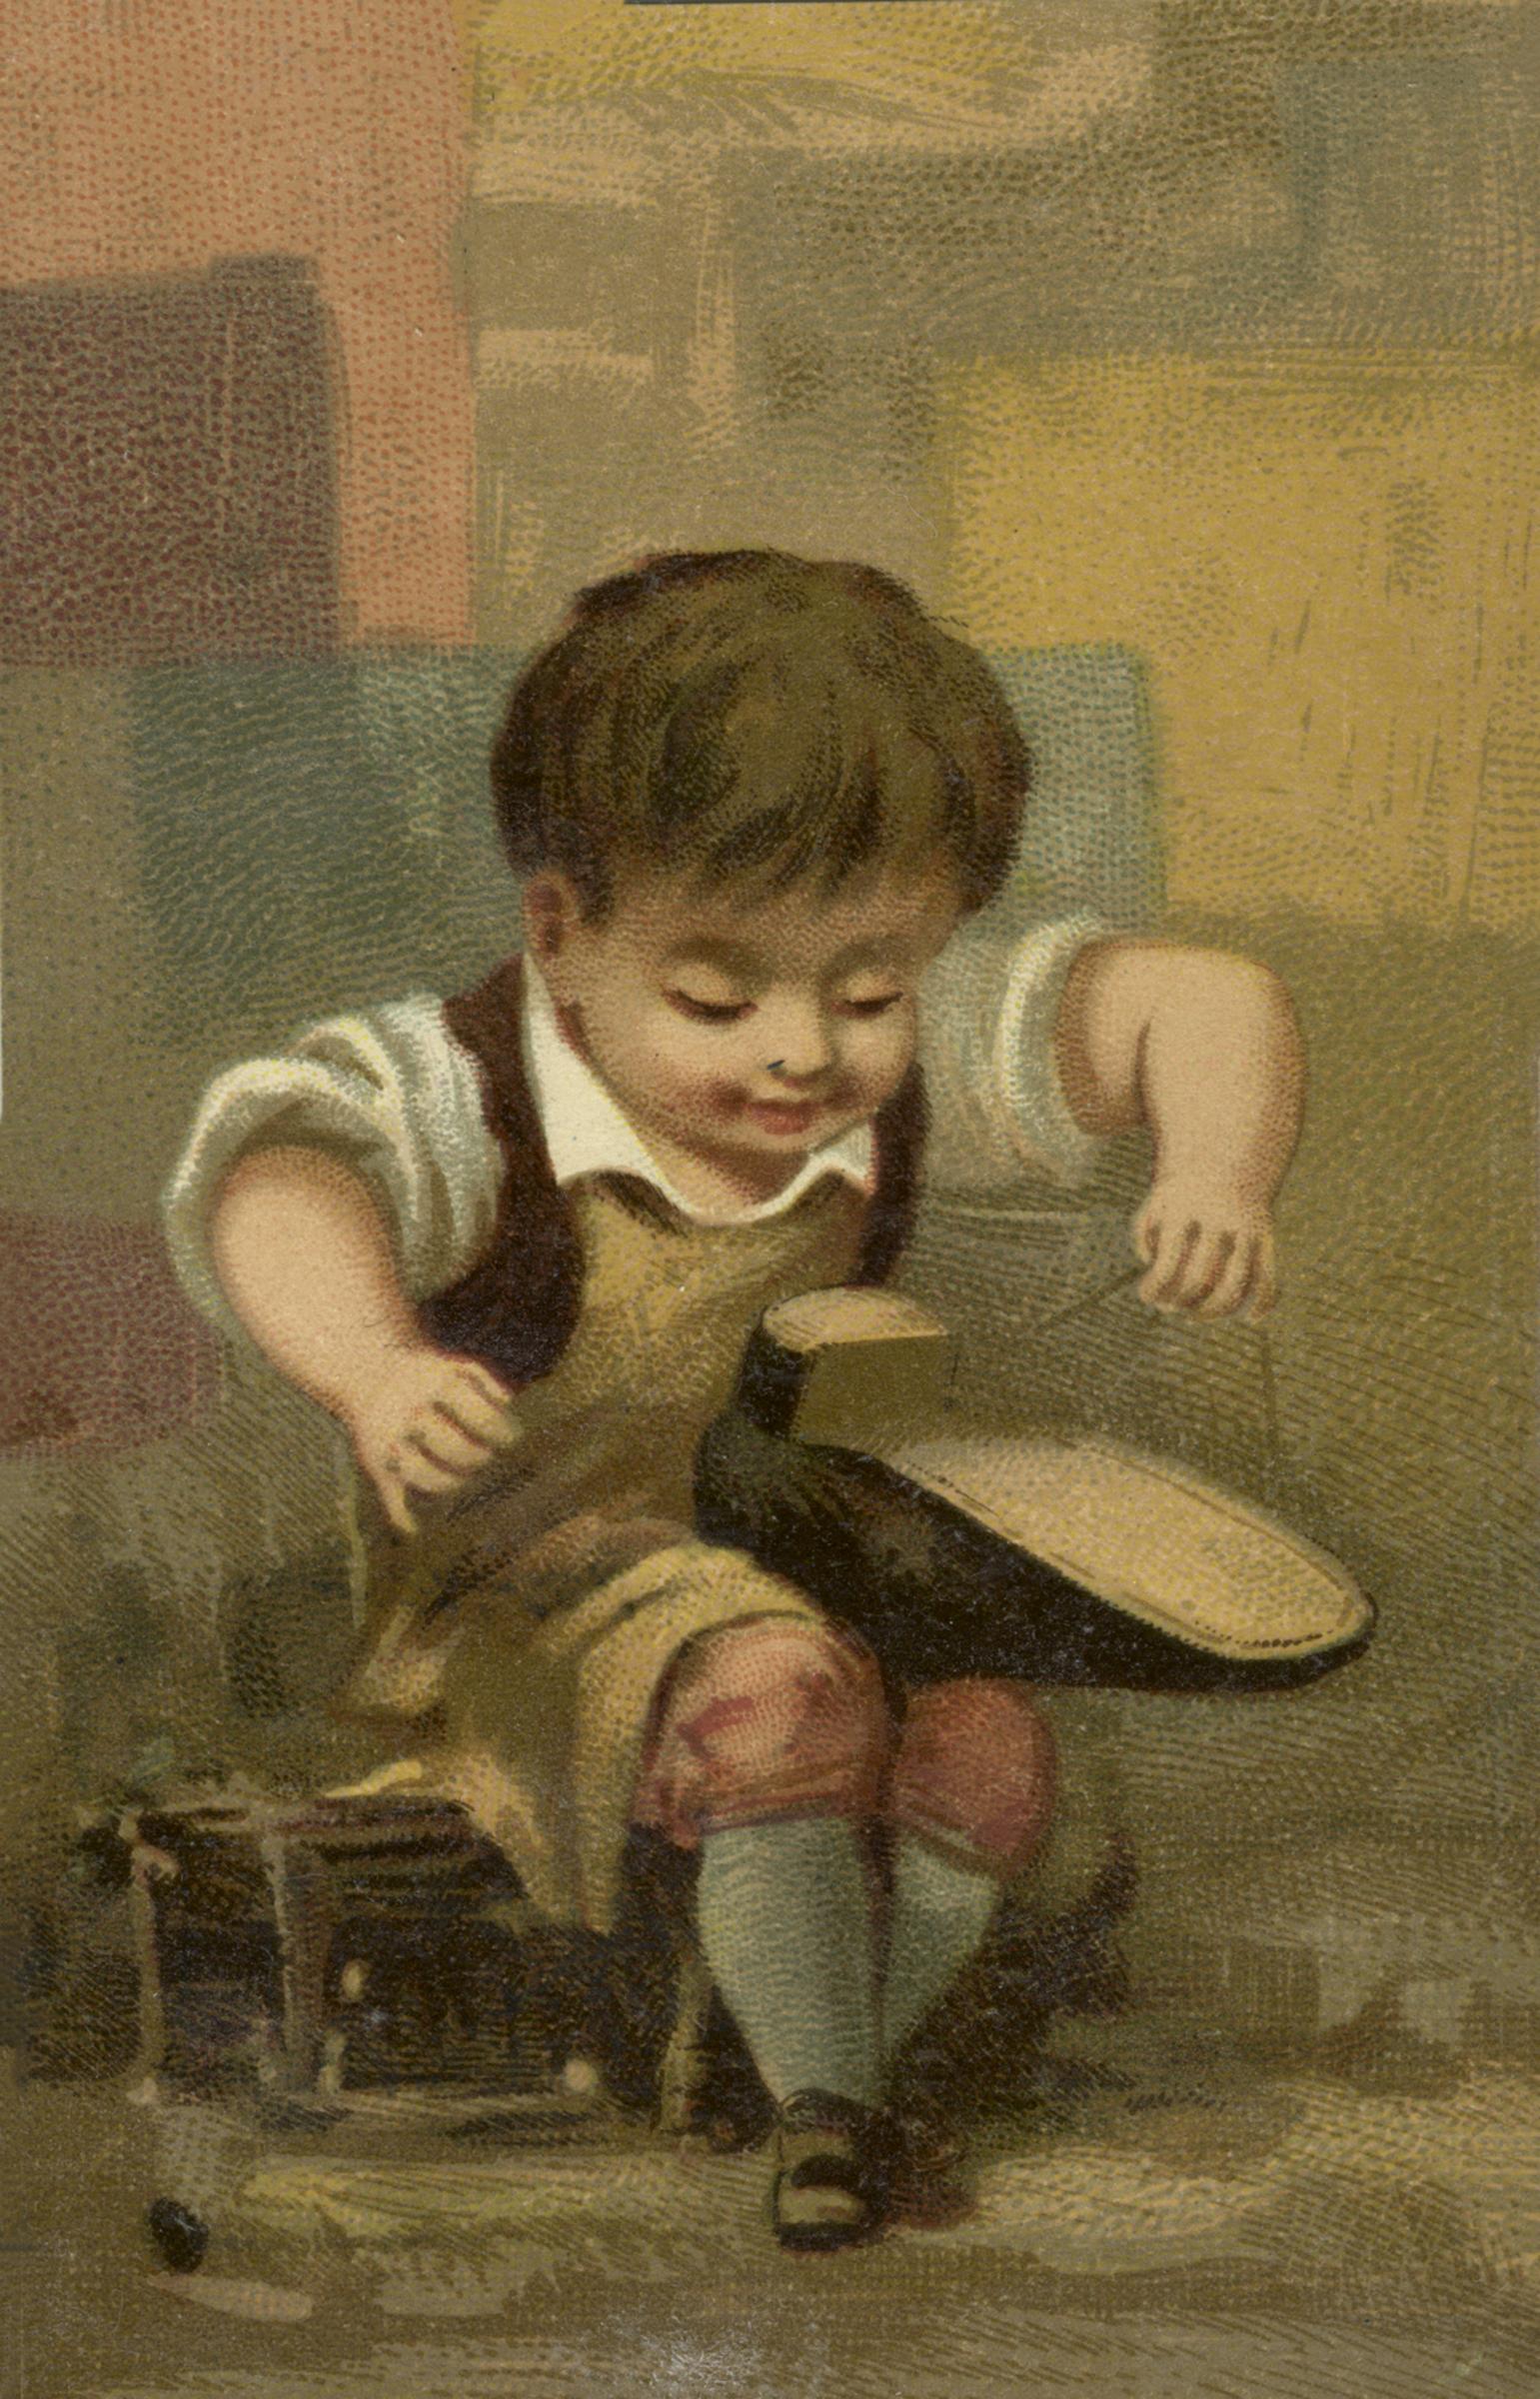 Vintage Boy Holding A Shoe - Cobbler